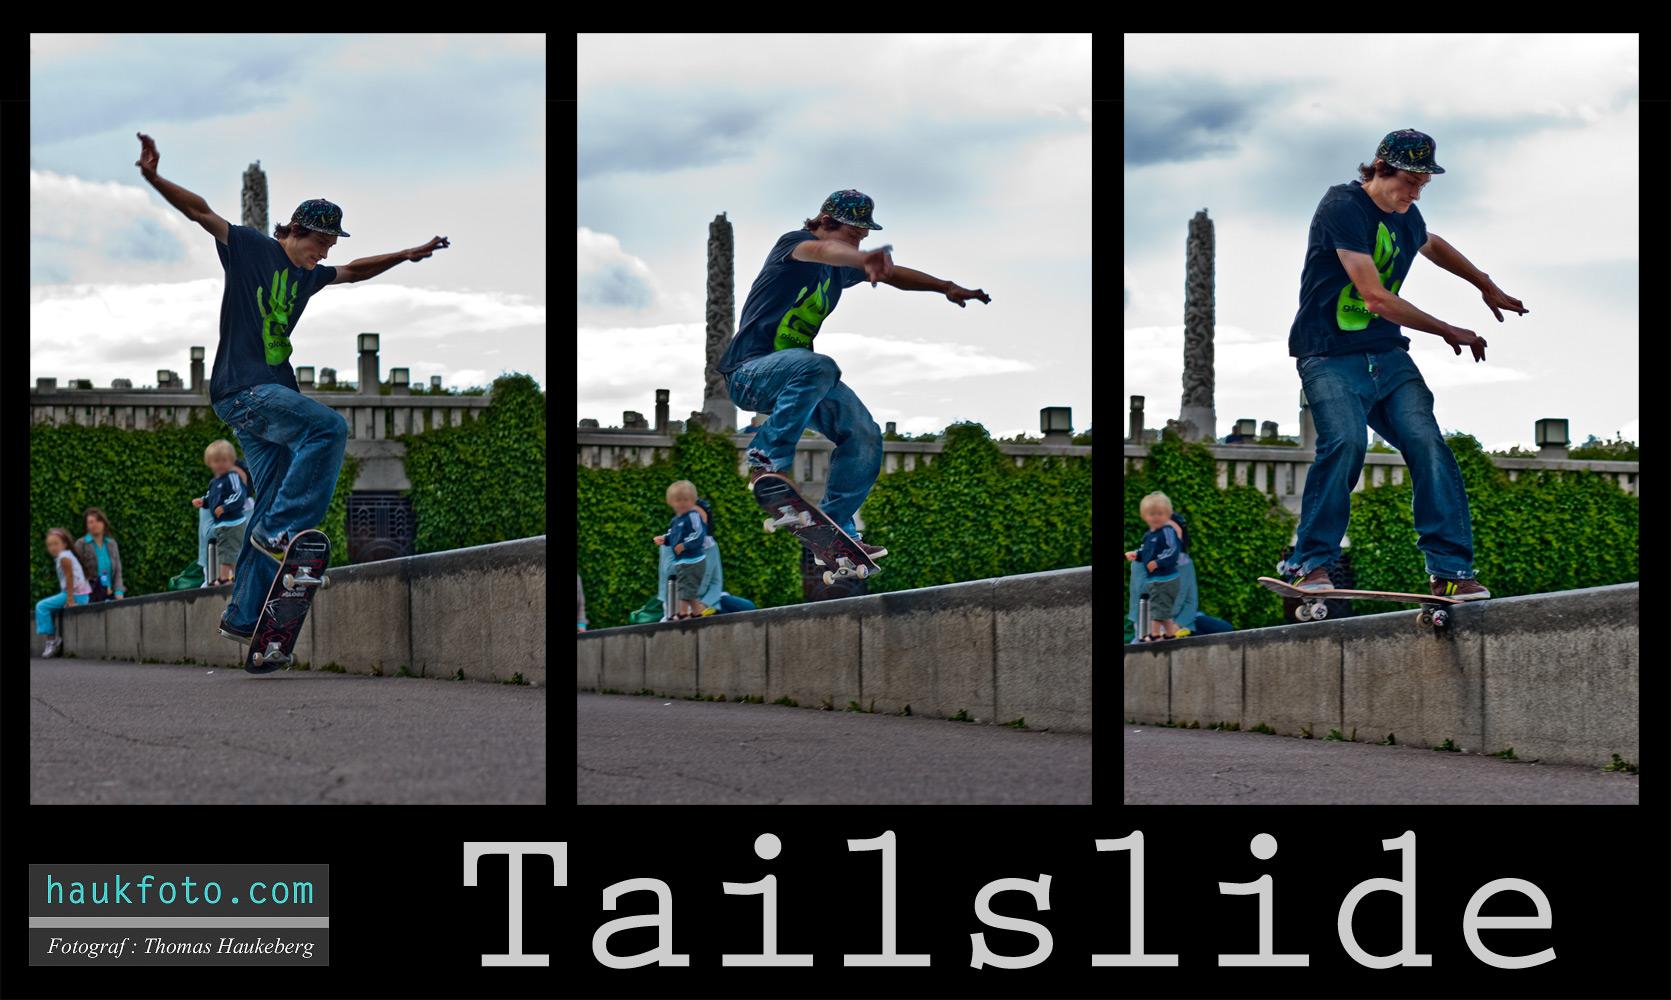 Atle Hansen Tailsliding in Frognerparken by OrisTheDog